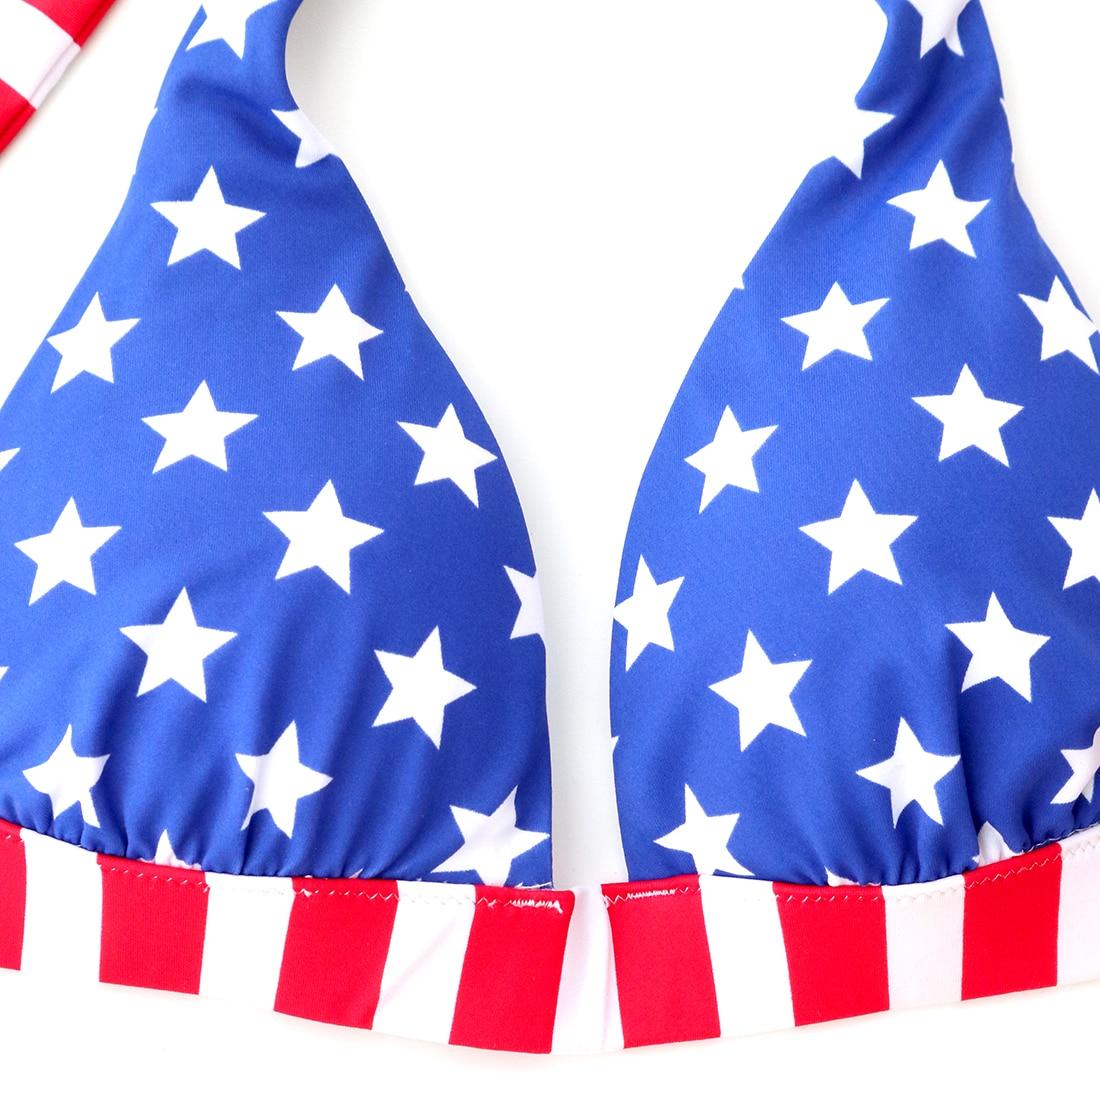 Swimsuits Bikini Bathing Suit Low Wait Wirt Free Print biquinis Women American Red Blue Star Flag Sexy Secret Swimwear 3